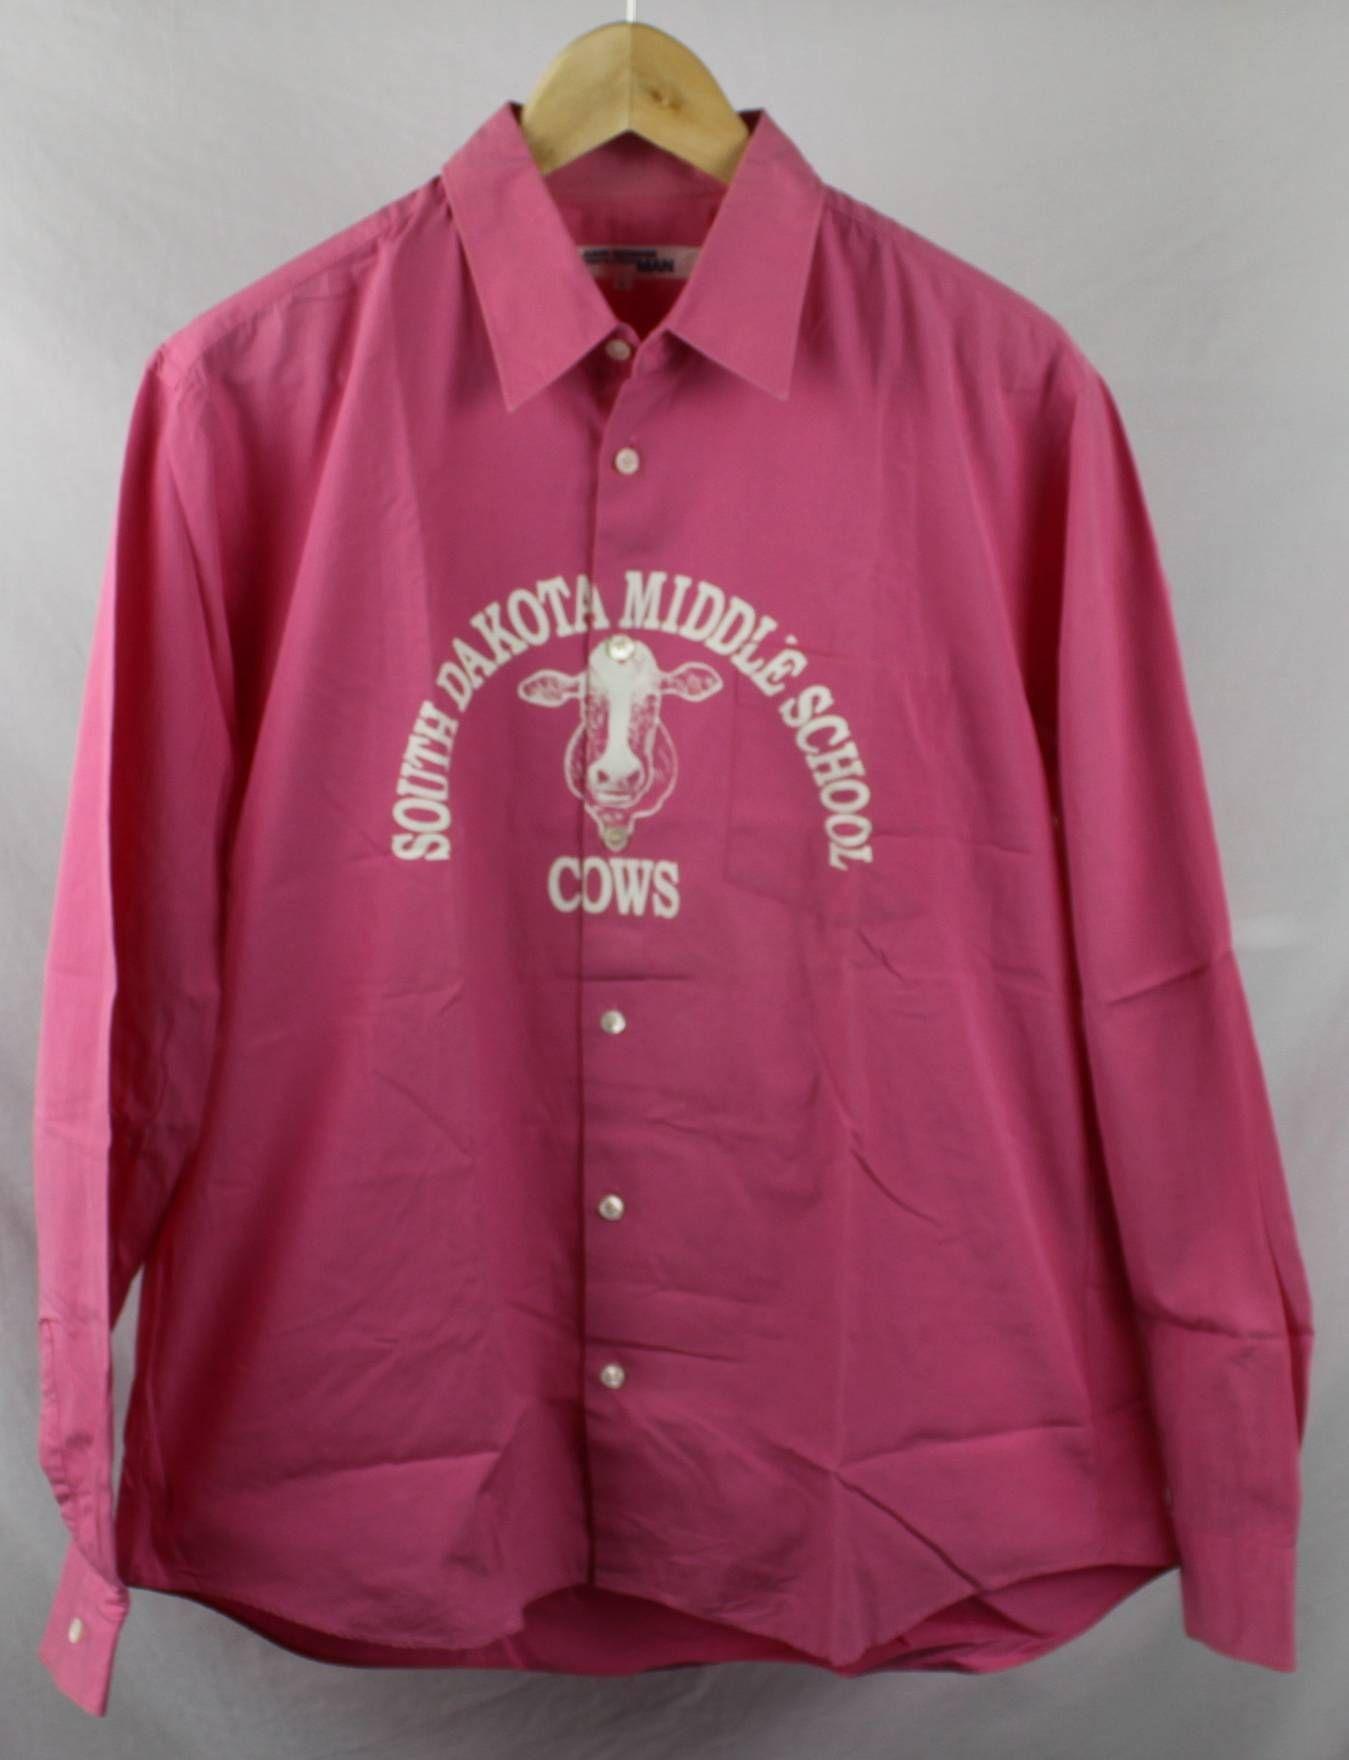 83c9d6d6284abb Junya Watanabe Pink South Dakota Middle School Cows Shirt Size US L   EU 52- 54   3